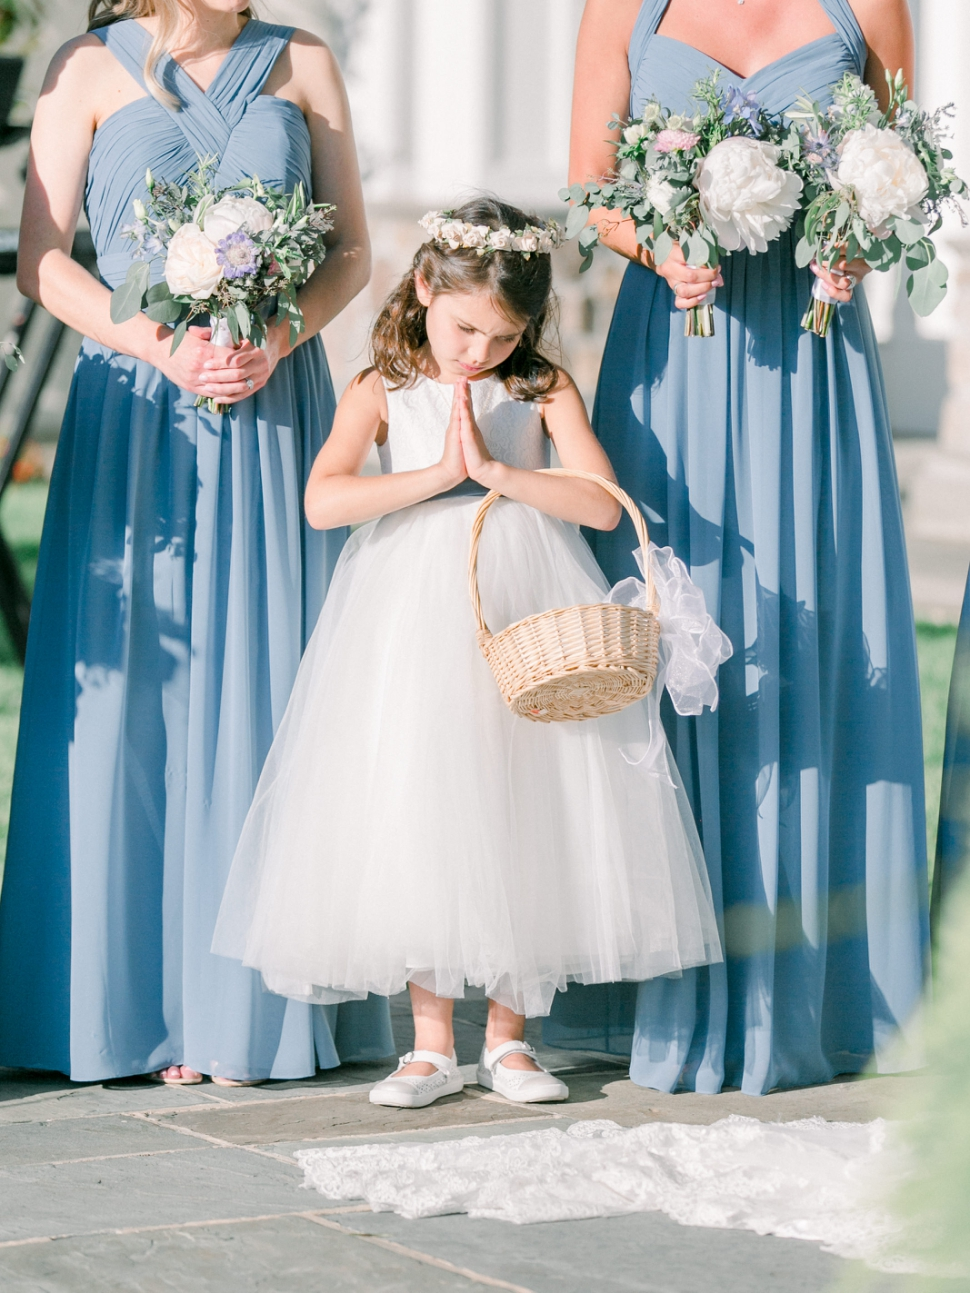 Ryland-Inn-Wedding-Photographer-Cassi-Claire_Ryland-Inn-Wedding_32.jpg